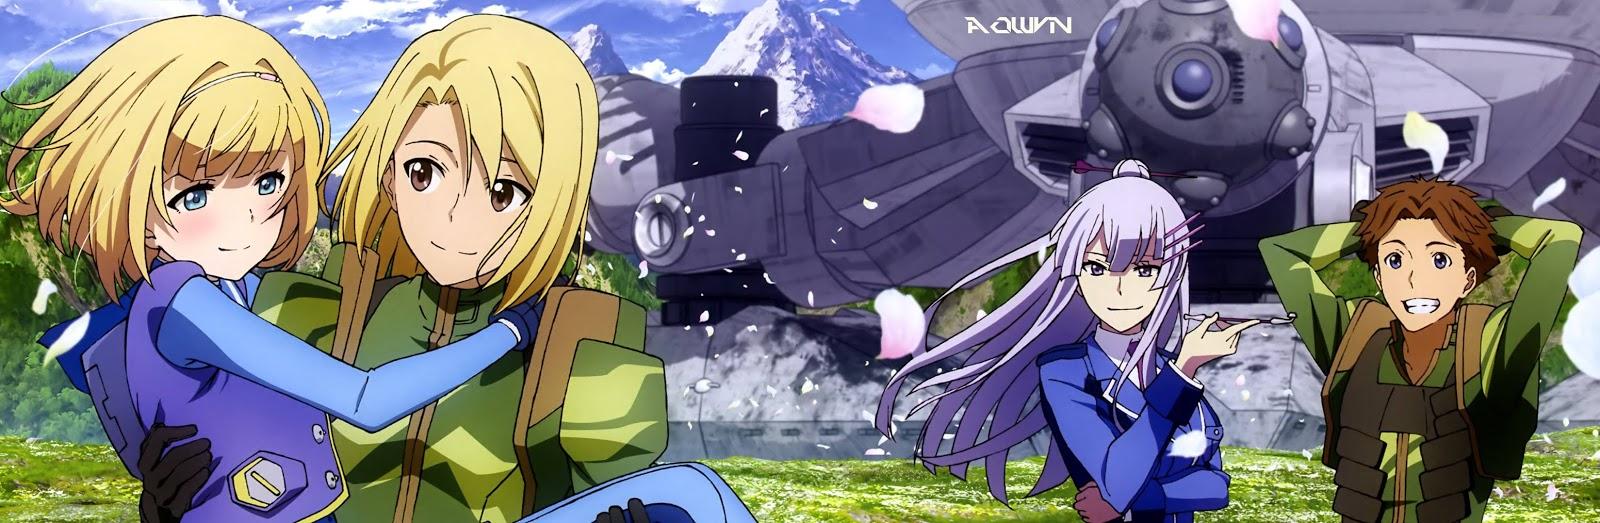 AowVN%2B%25285%2529 - [ Anime 3gp Mp4 ] Heavy Object | Vietsub - Mecha Art Đẹp